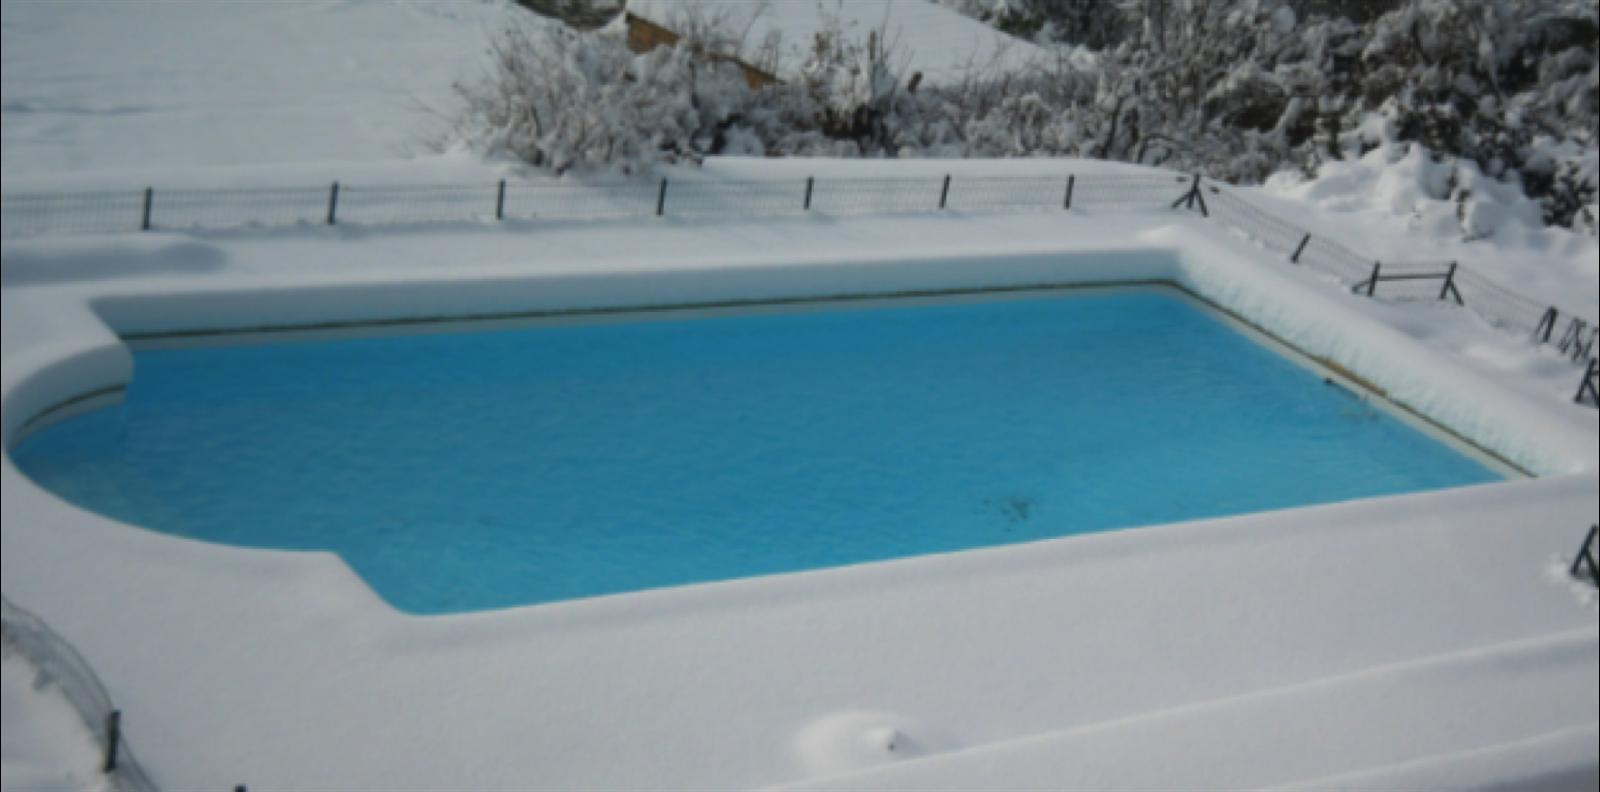 hiverner sa piscine les solutions aquilus le blog d 39 aquilus. Black Bedroom Furniture Sets. Home Design Ideas